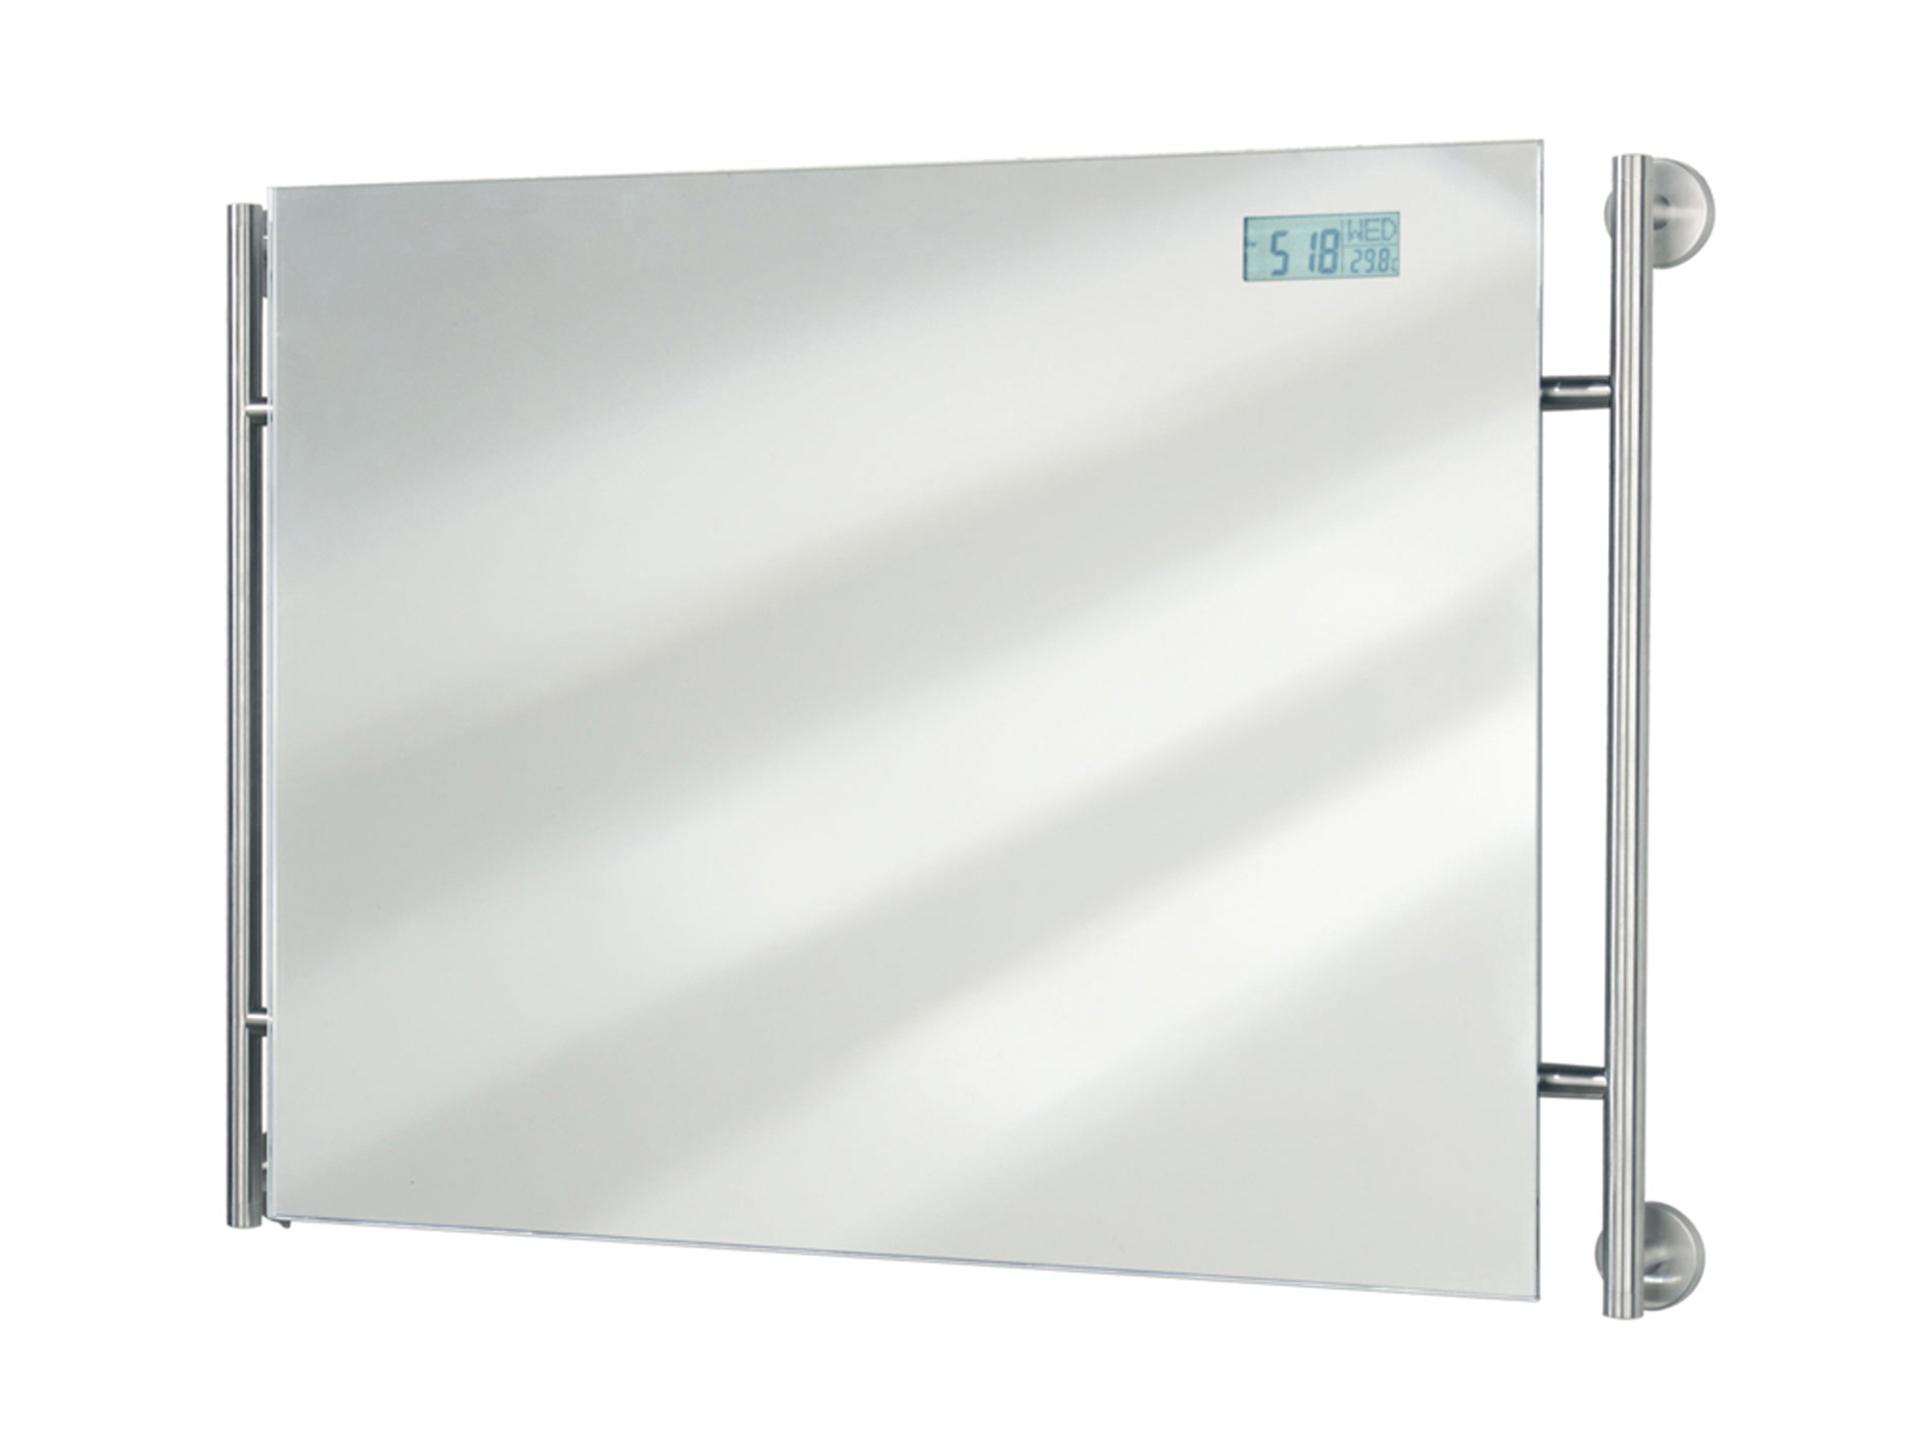 Spiegel Met Klok : Tiger boston spiegel met digitale klok en thermometer 73x53 cm